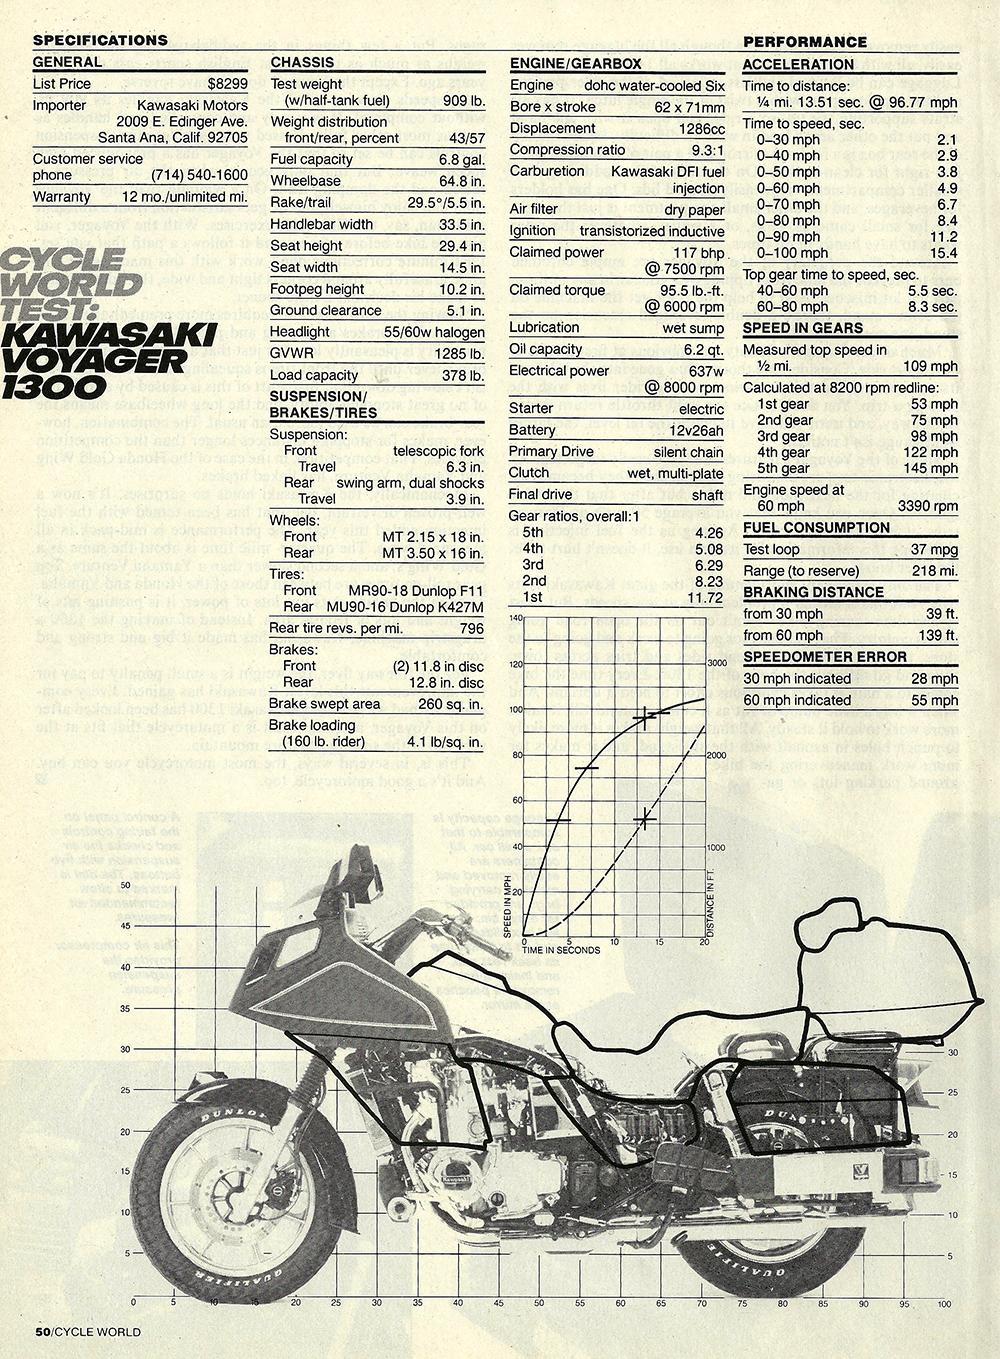 1983 Kawasaki Voyager 1300 road test 07.jpg